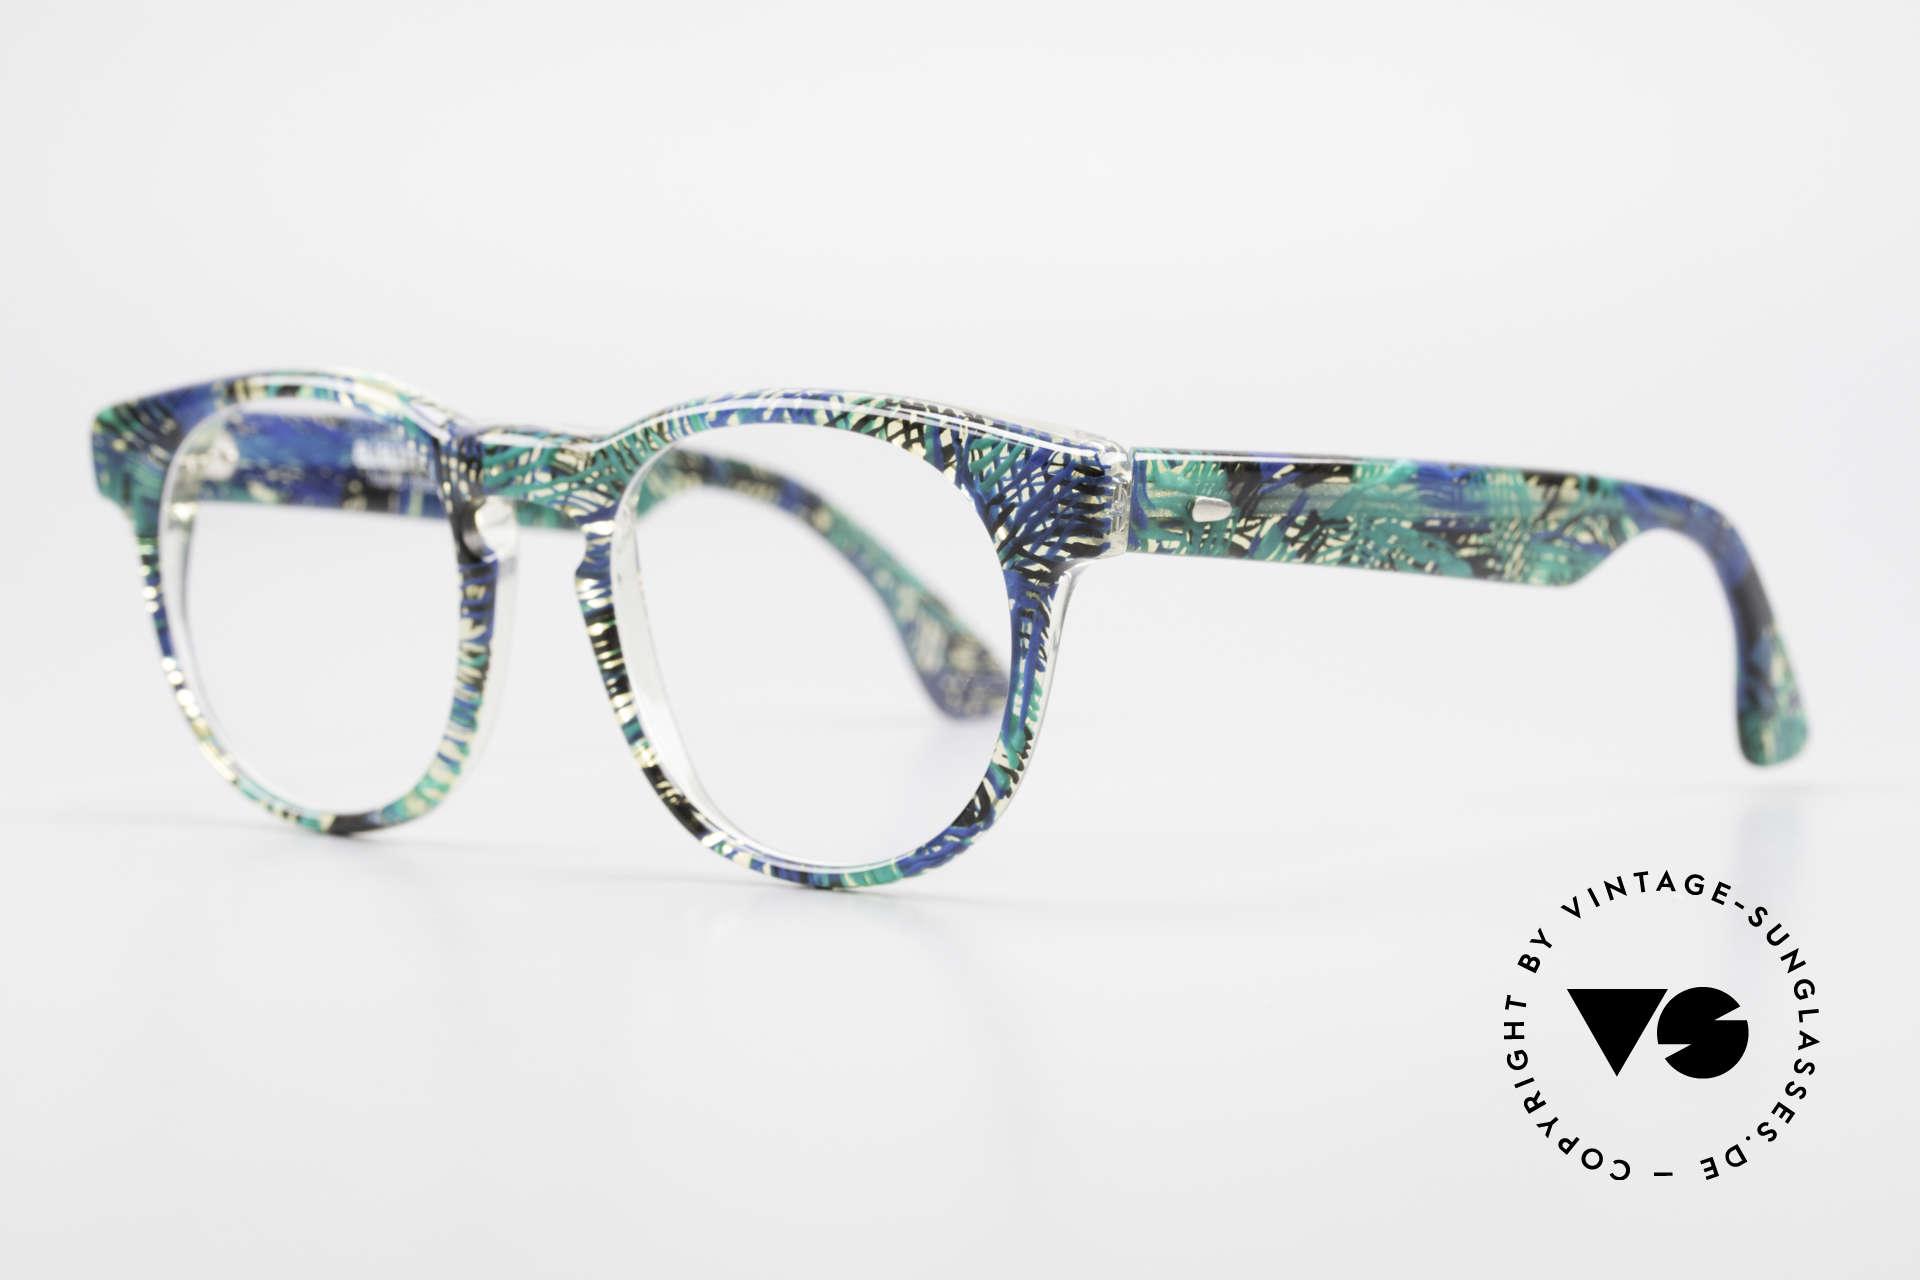 Alain Mikli 903 / 391 Panto Frame Green Patterned, inspired by the 1960's 'Tart Optical Arnel' frames, Made for Men and Women